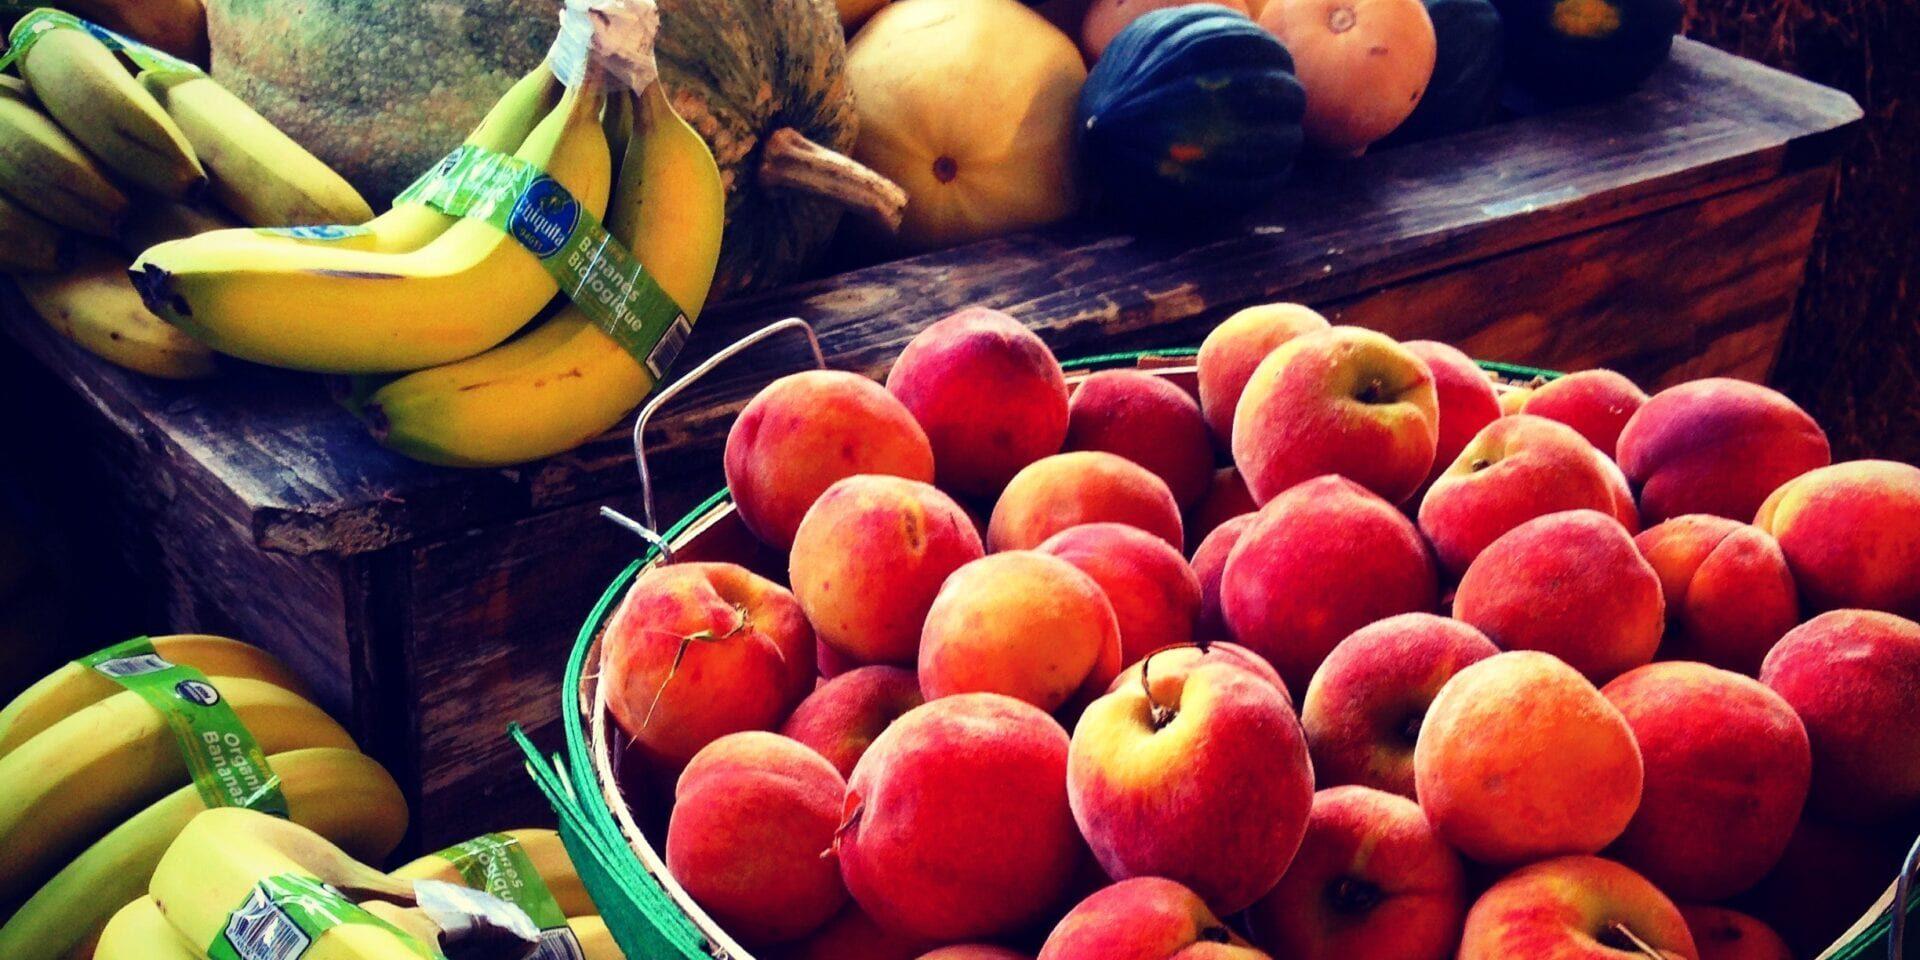 red-apples-in-brown-wooden-bucket-220911